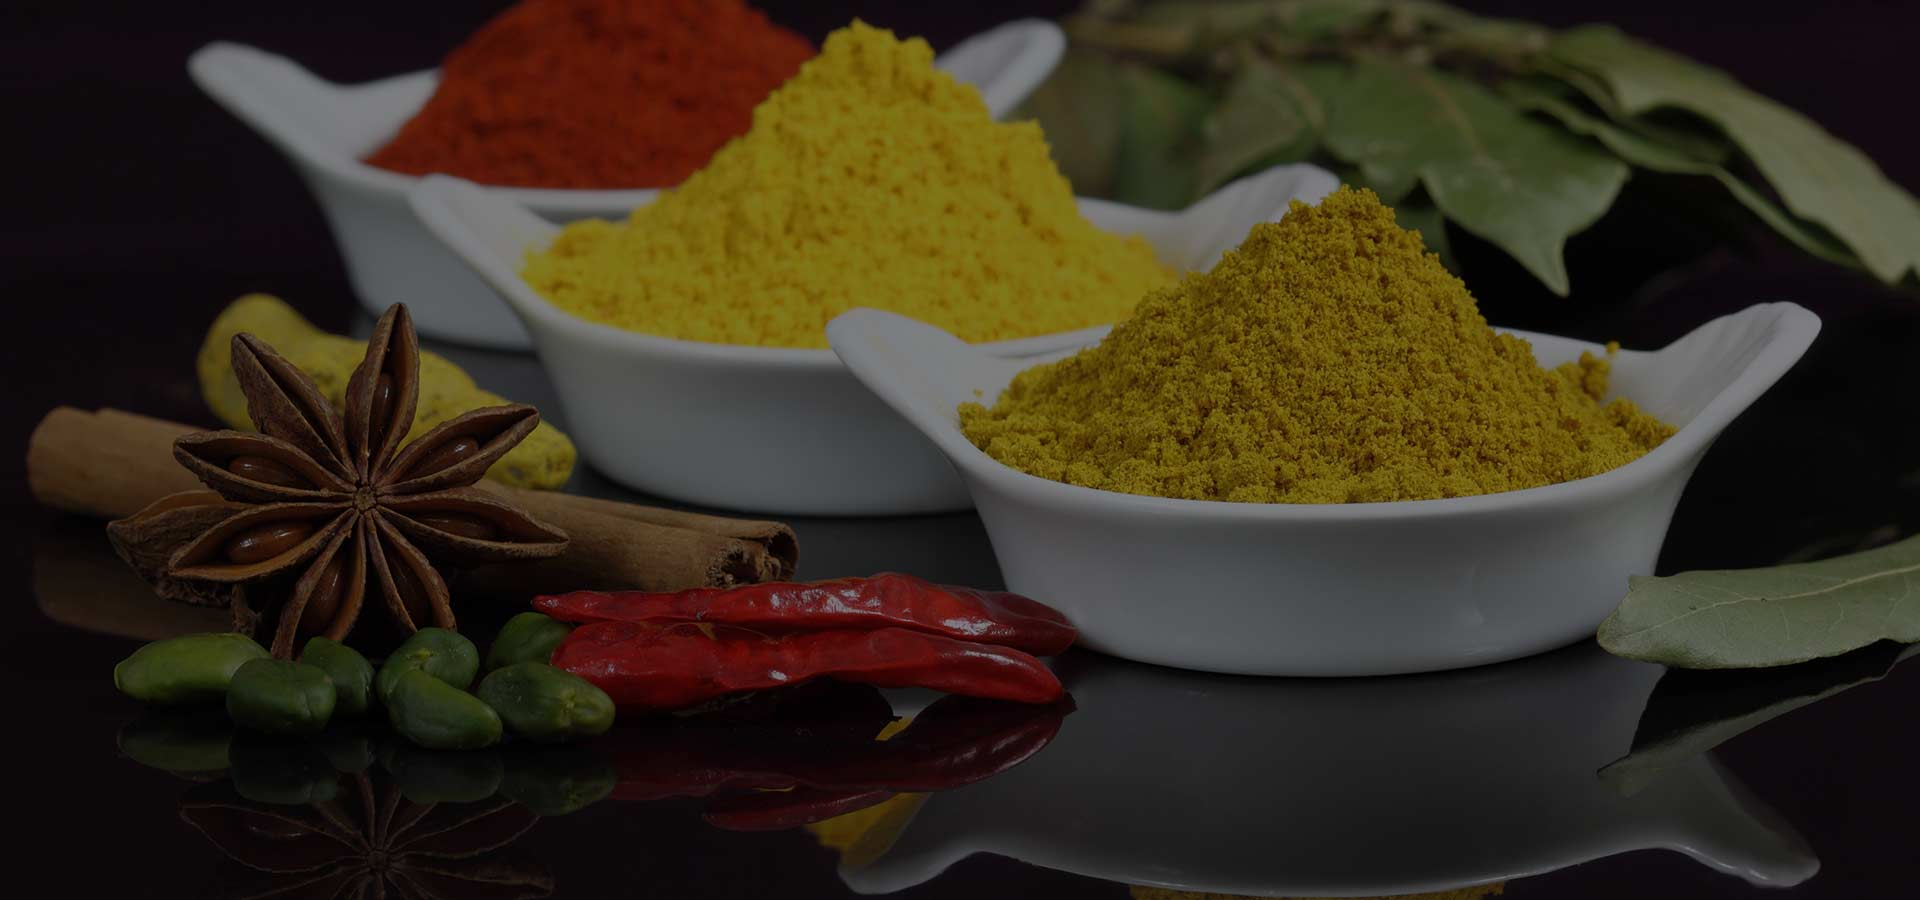 Naga's - The Spice Minister   Naga's - The Spice Minister